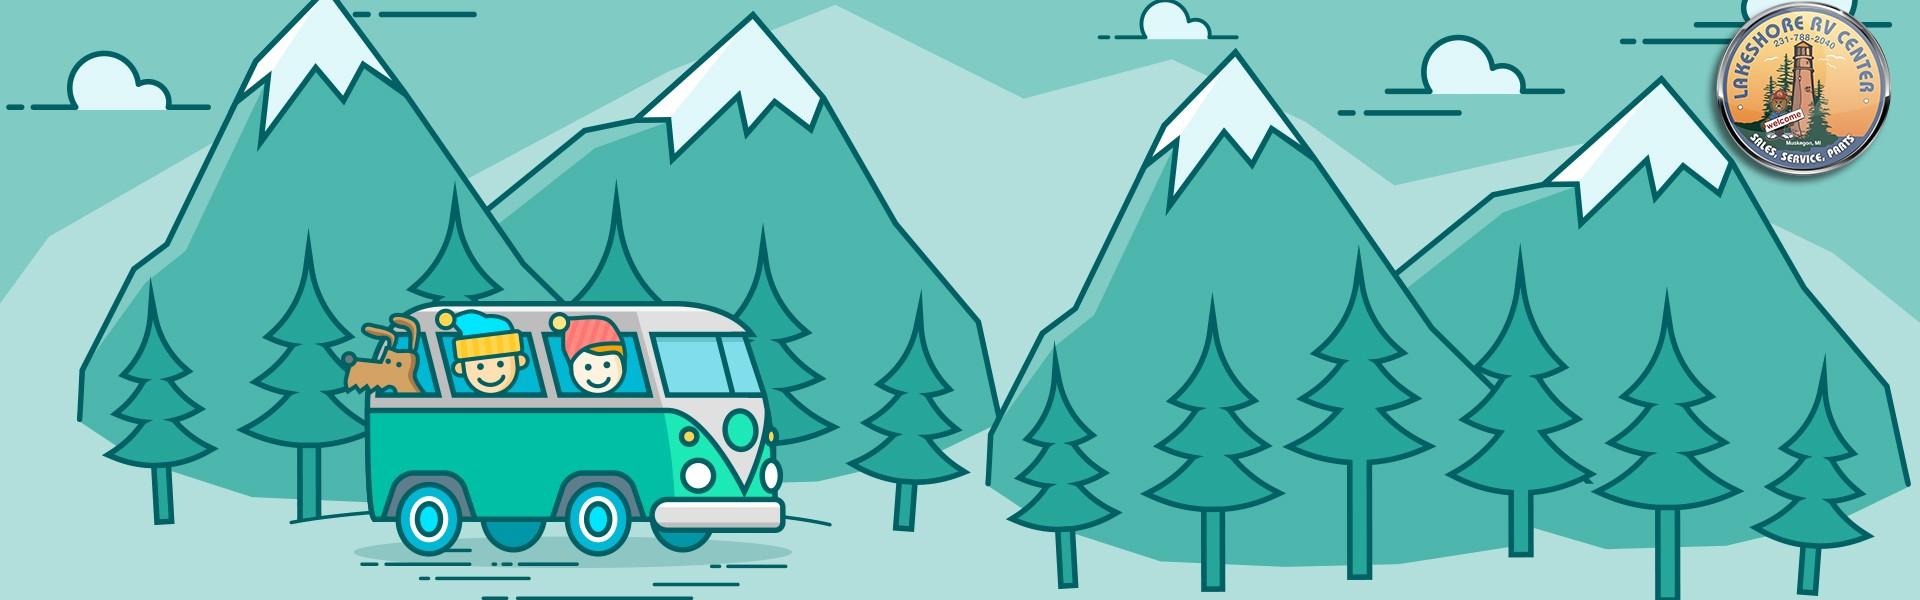 RVs perfect for winter